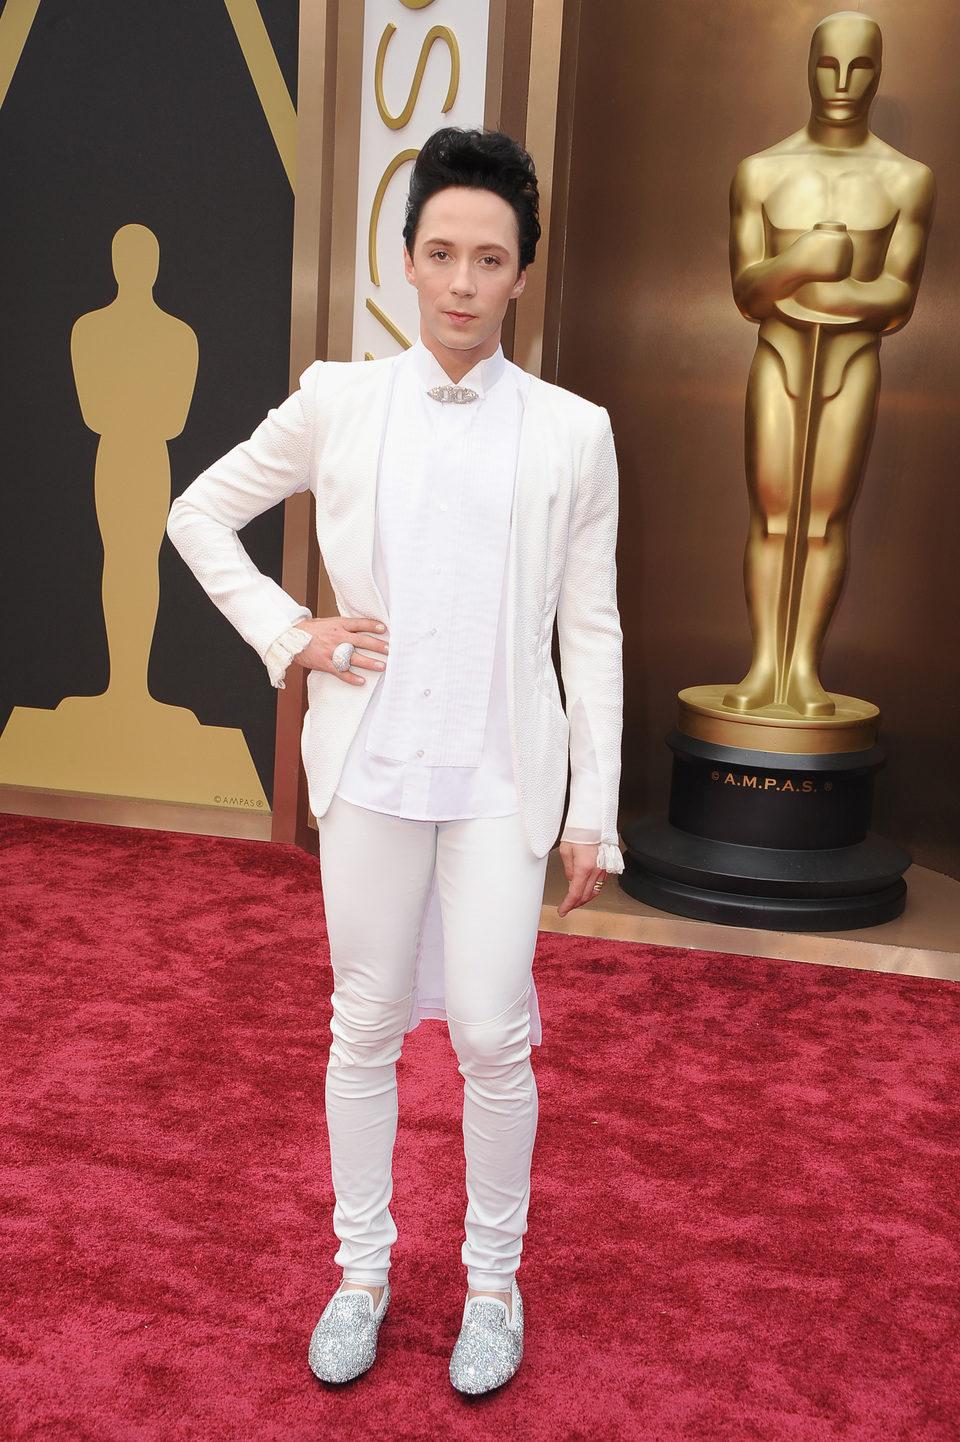 Johnny Weir at the 2014 Academy Awards